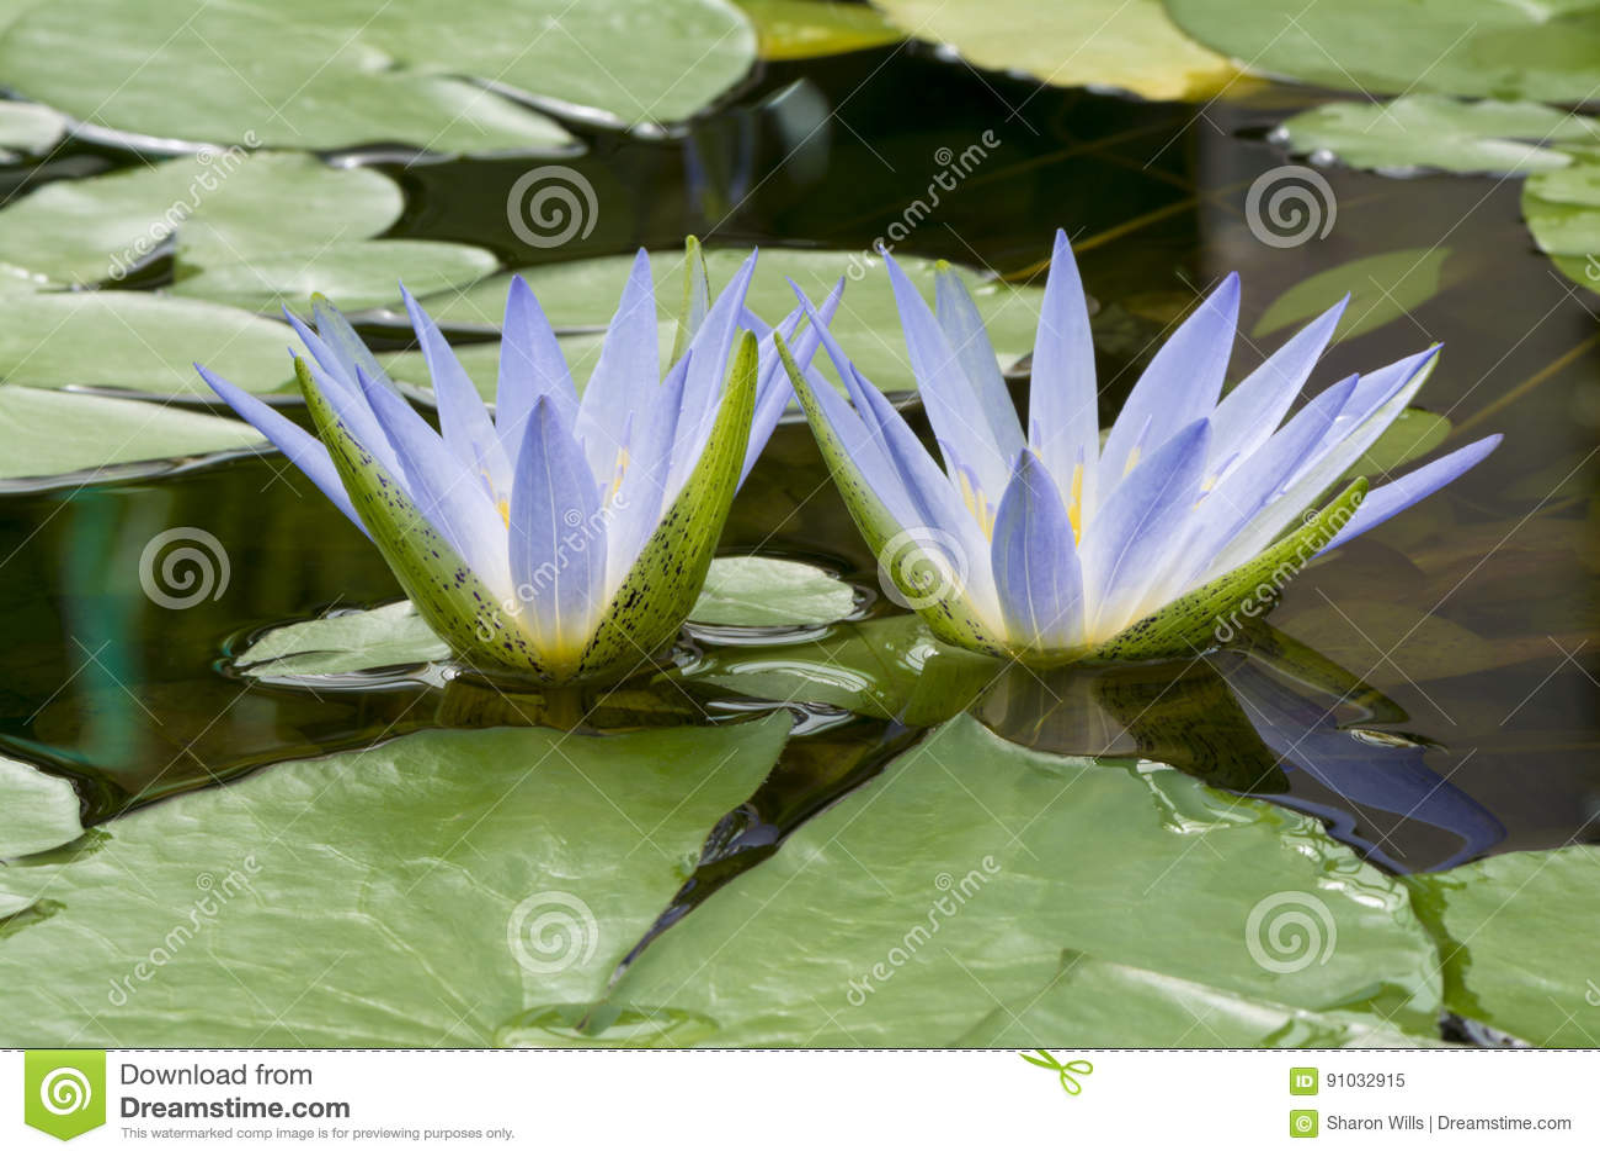 Blue lotus of egypt nymphaea caerulea waterlilies stock image blue lotus of egypt nymphaea caerulea waterlilies izmirmasajfo